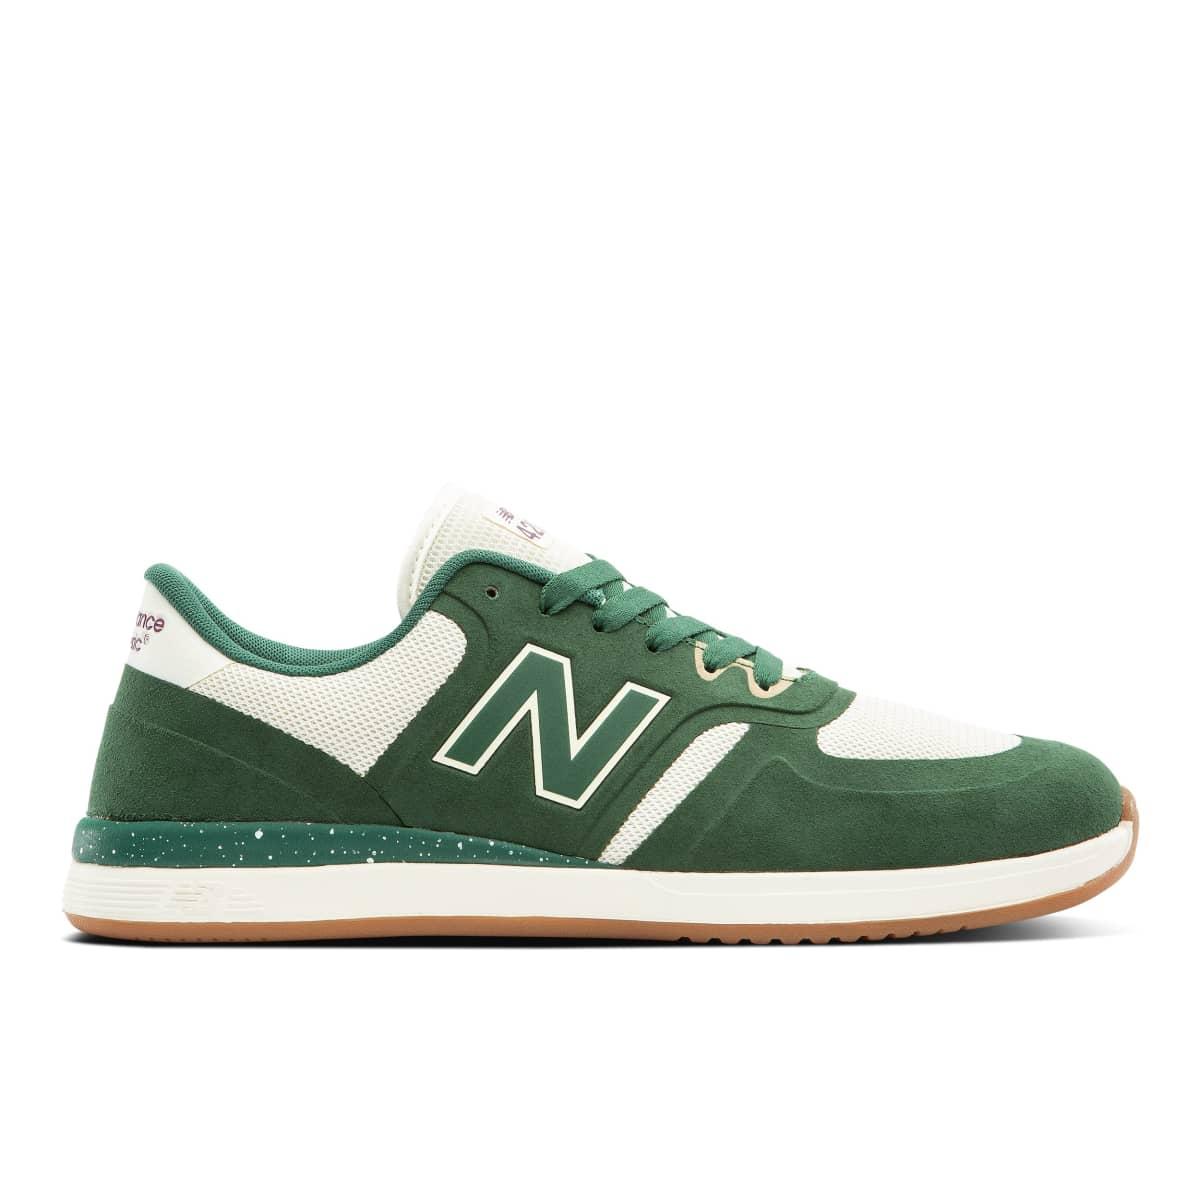 New Balance Numeric 420 04/20 (Green/White)